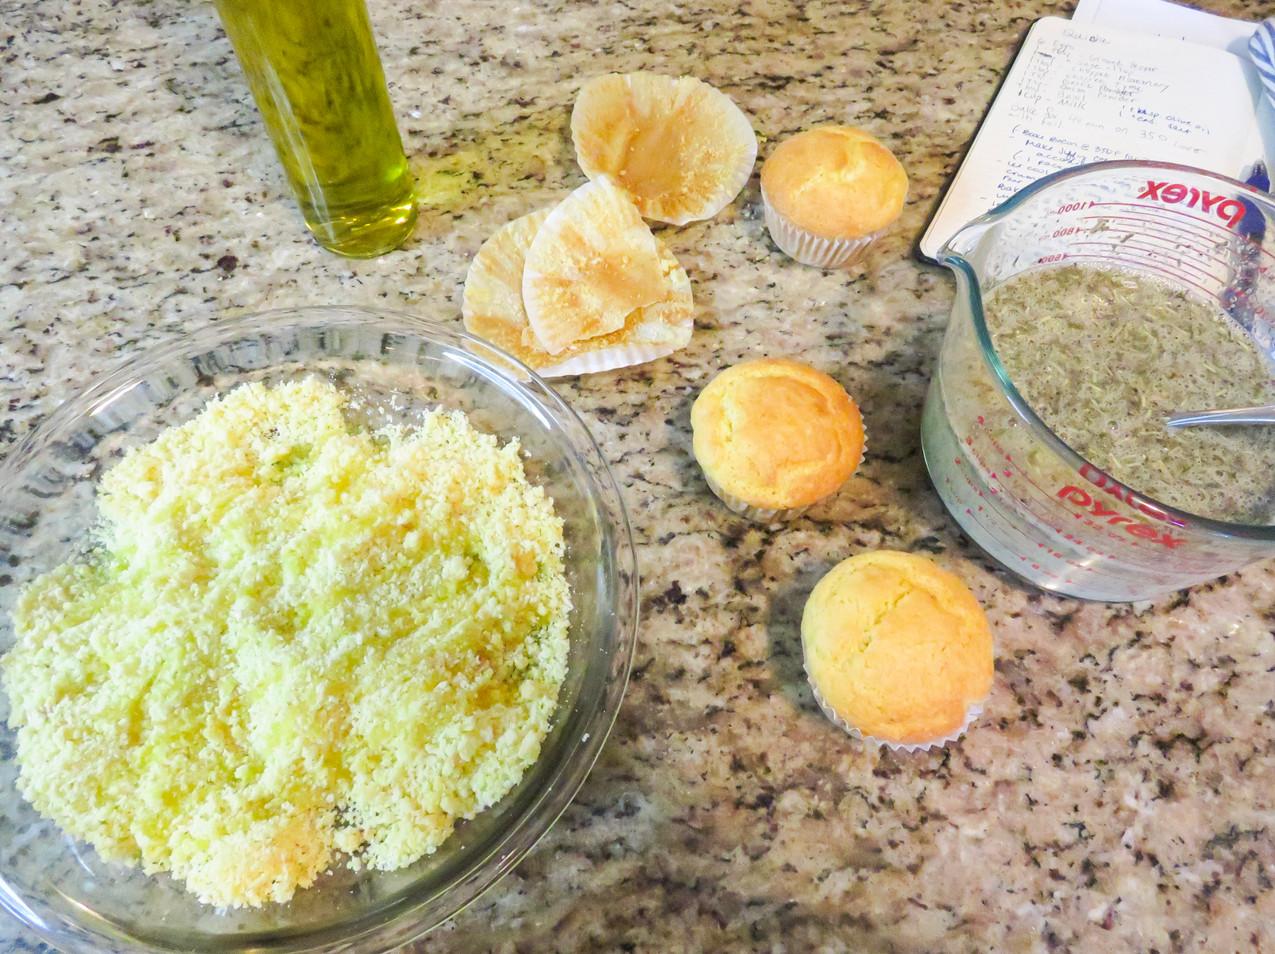 Cornbread muffins crumbled into a pan.